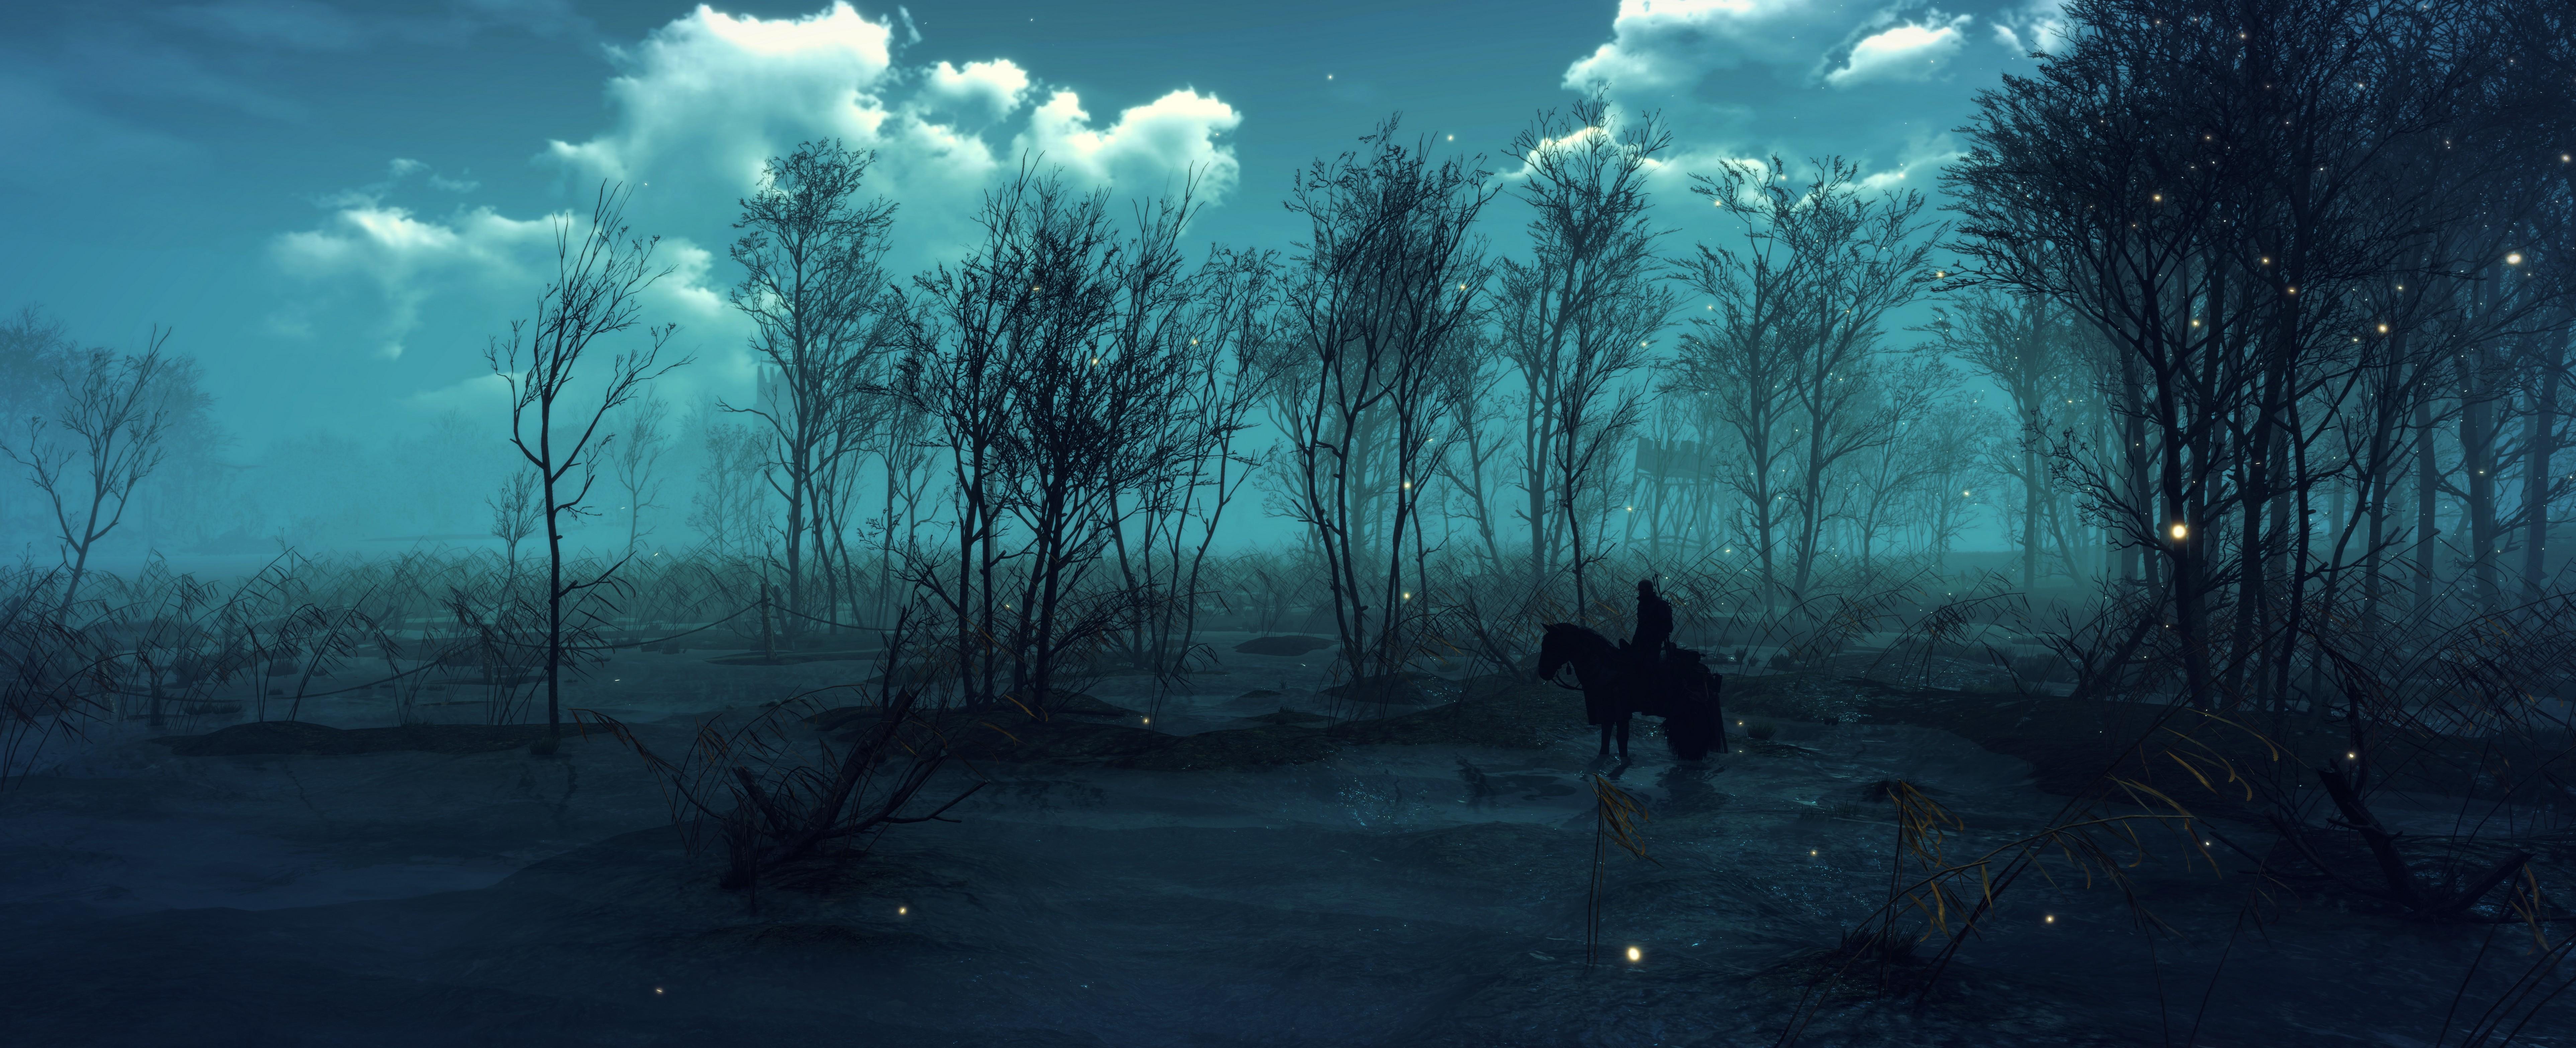 =_= - Witcher 3: Wild Hunt, the